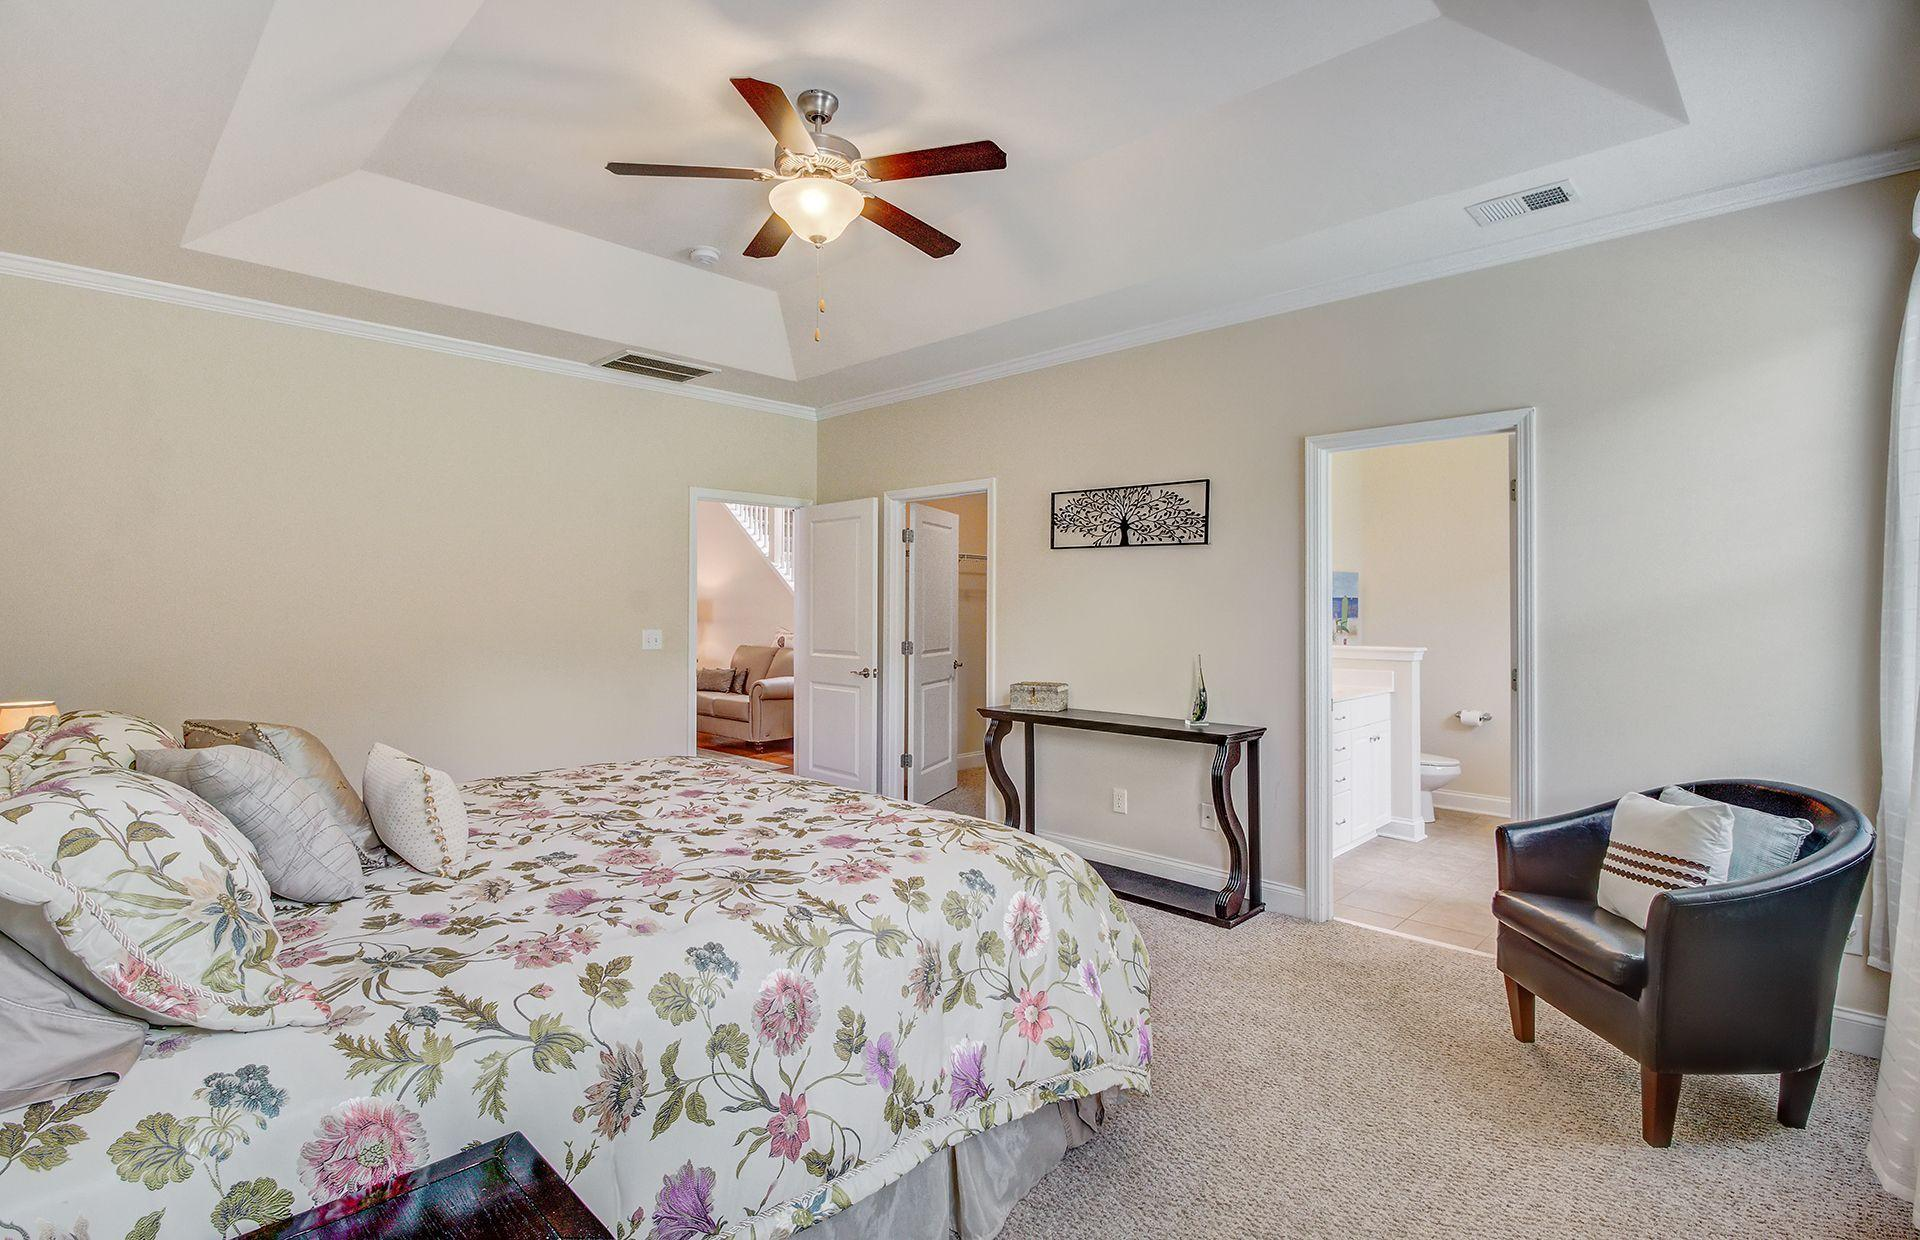 Linnen Place Homes For Sale - 1275 Shingleback, Mount Pleasant, SC - 26